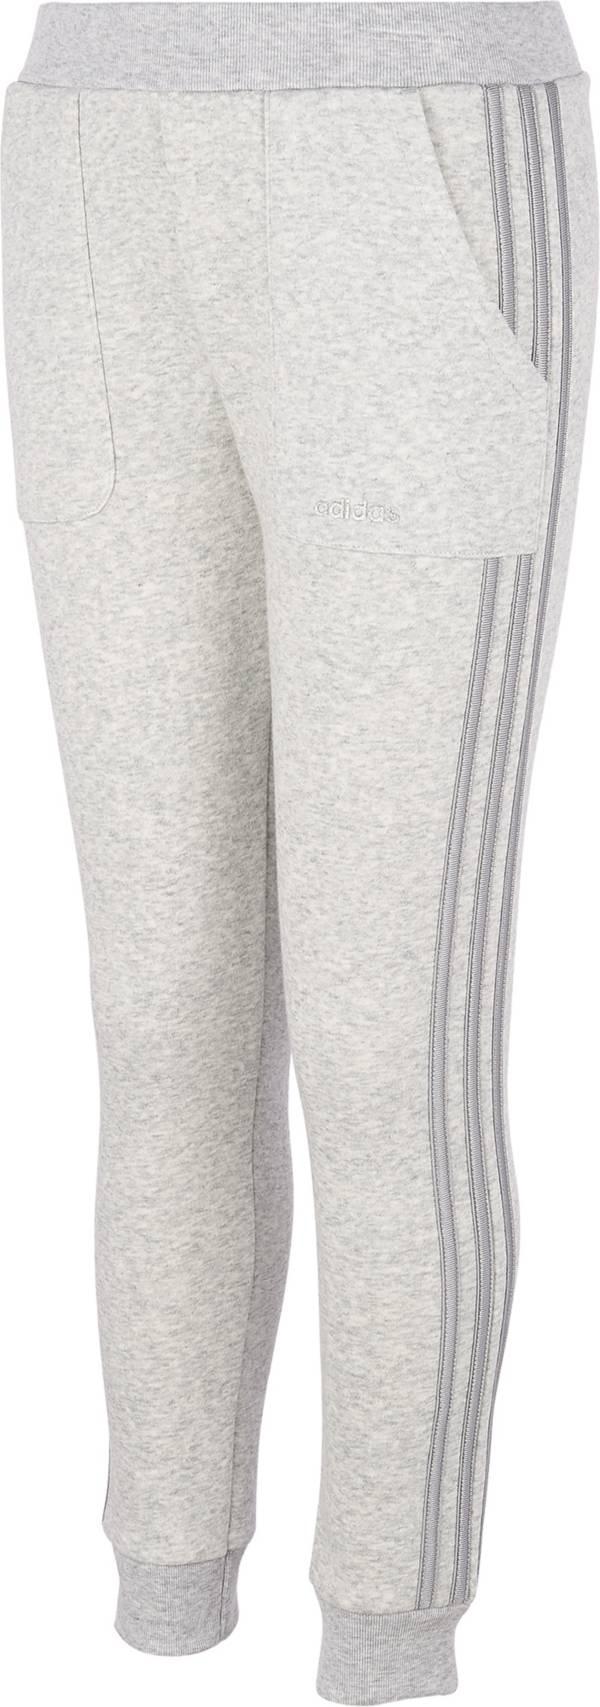 adidas Little Girls' Fleece Stripe Jogger Pants product image